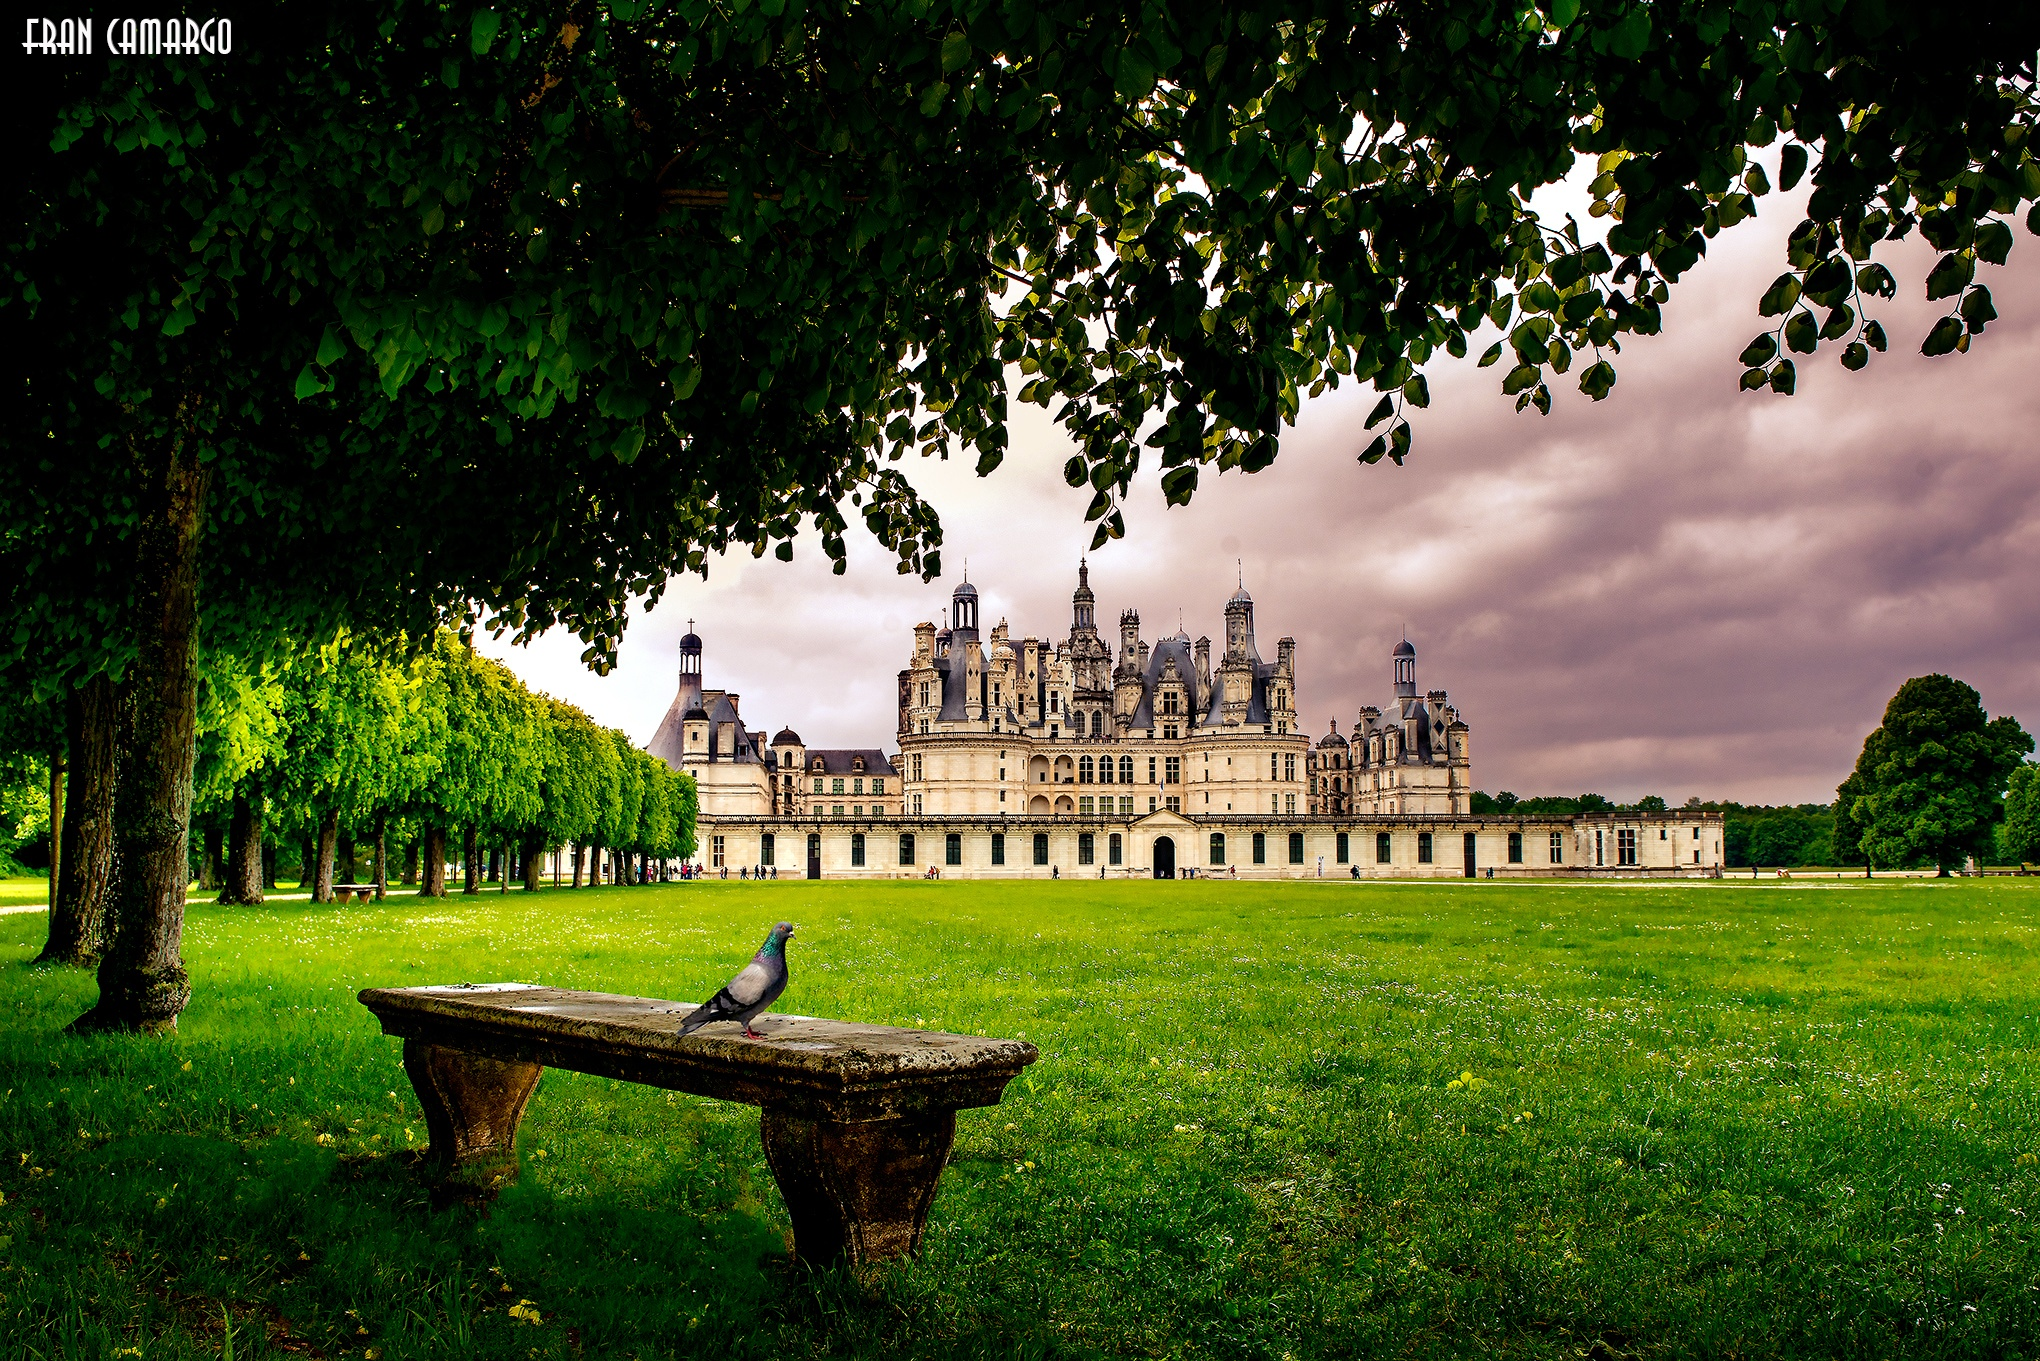 Chambord Castle by Fran Camargo